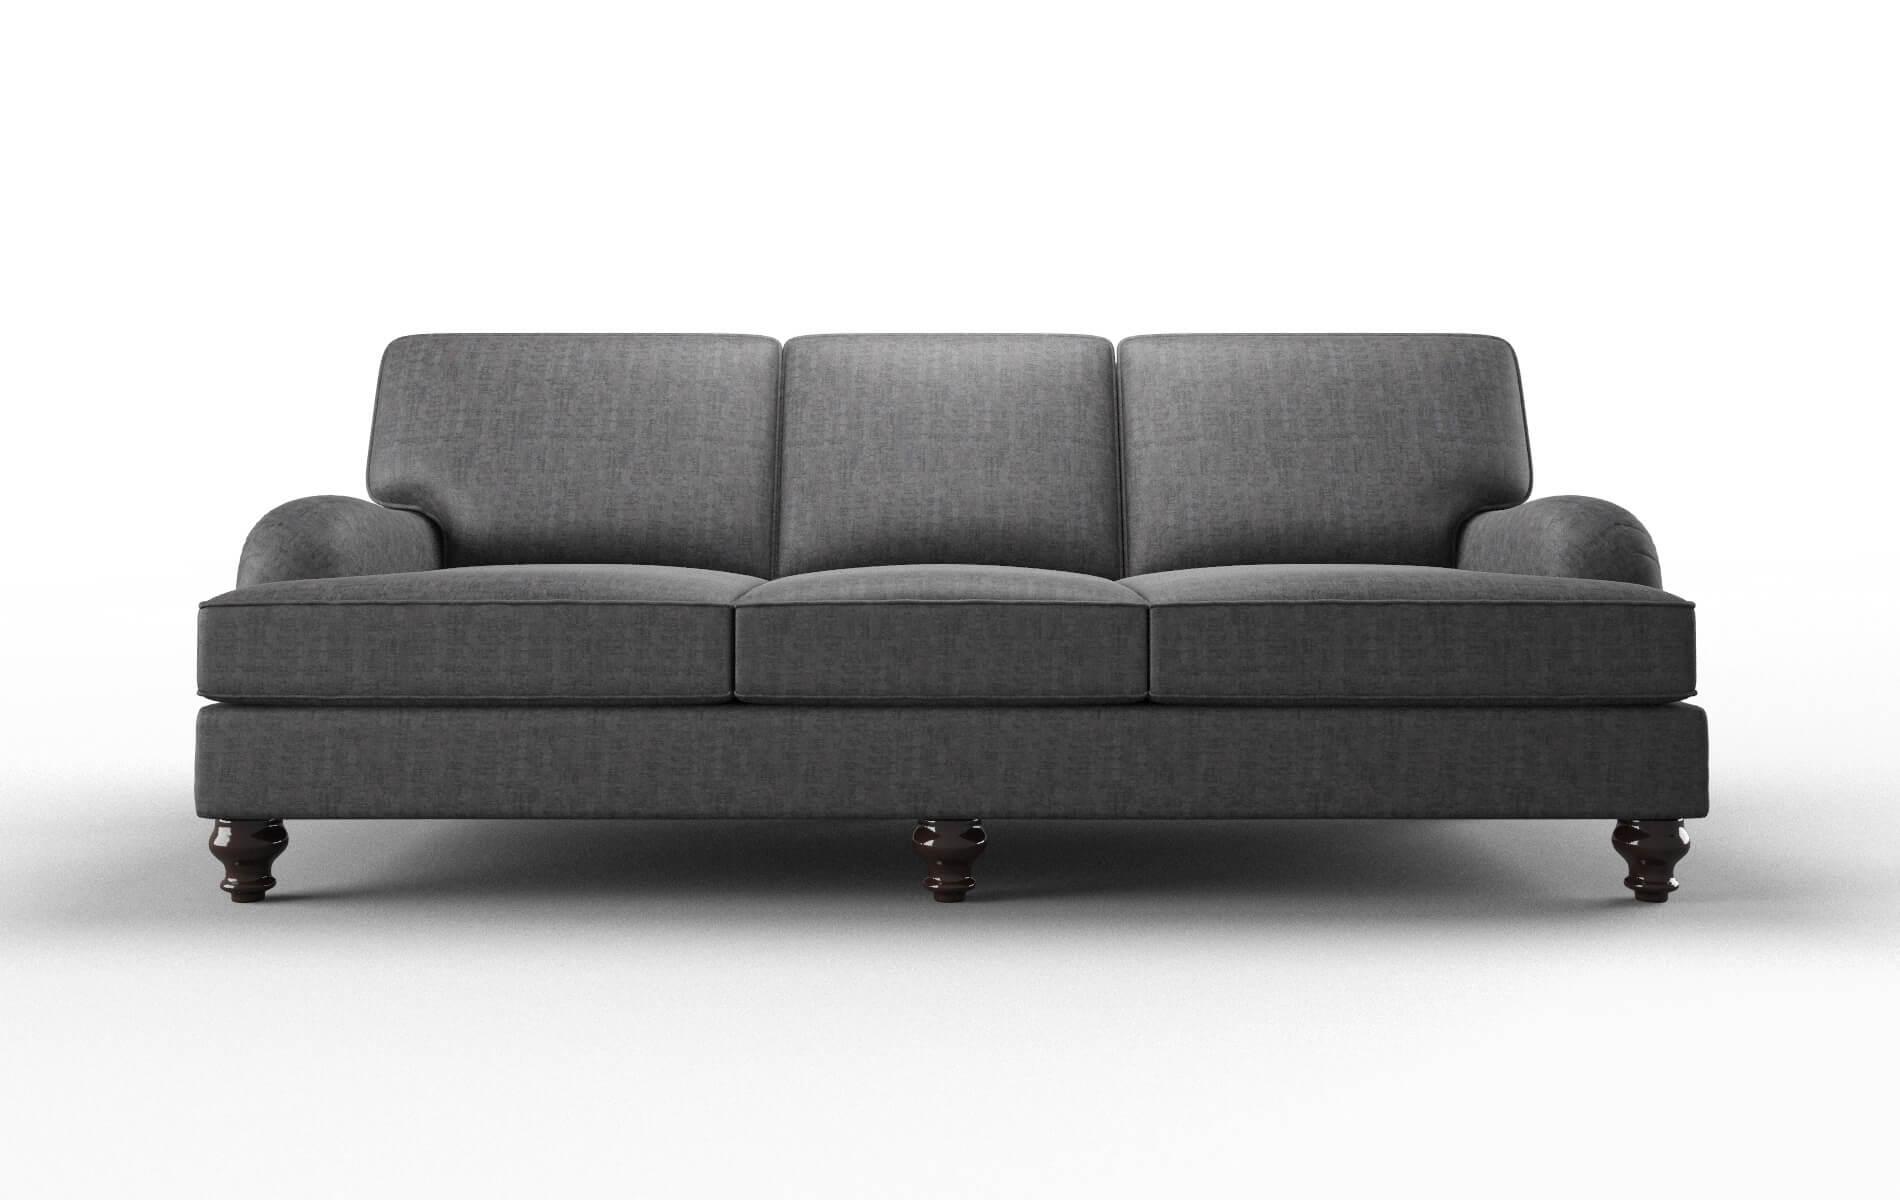 Terrific Hamilton Marcy Baltic Sofa Dreamsofa Caraccident5 Cool Chair Designs And Ideas Caraccident5Info